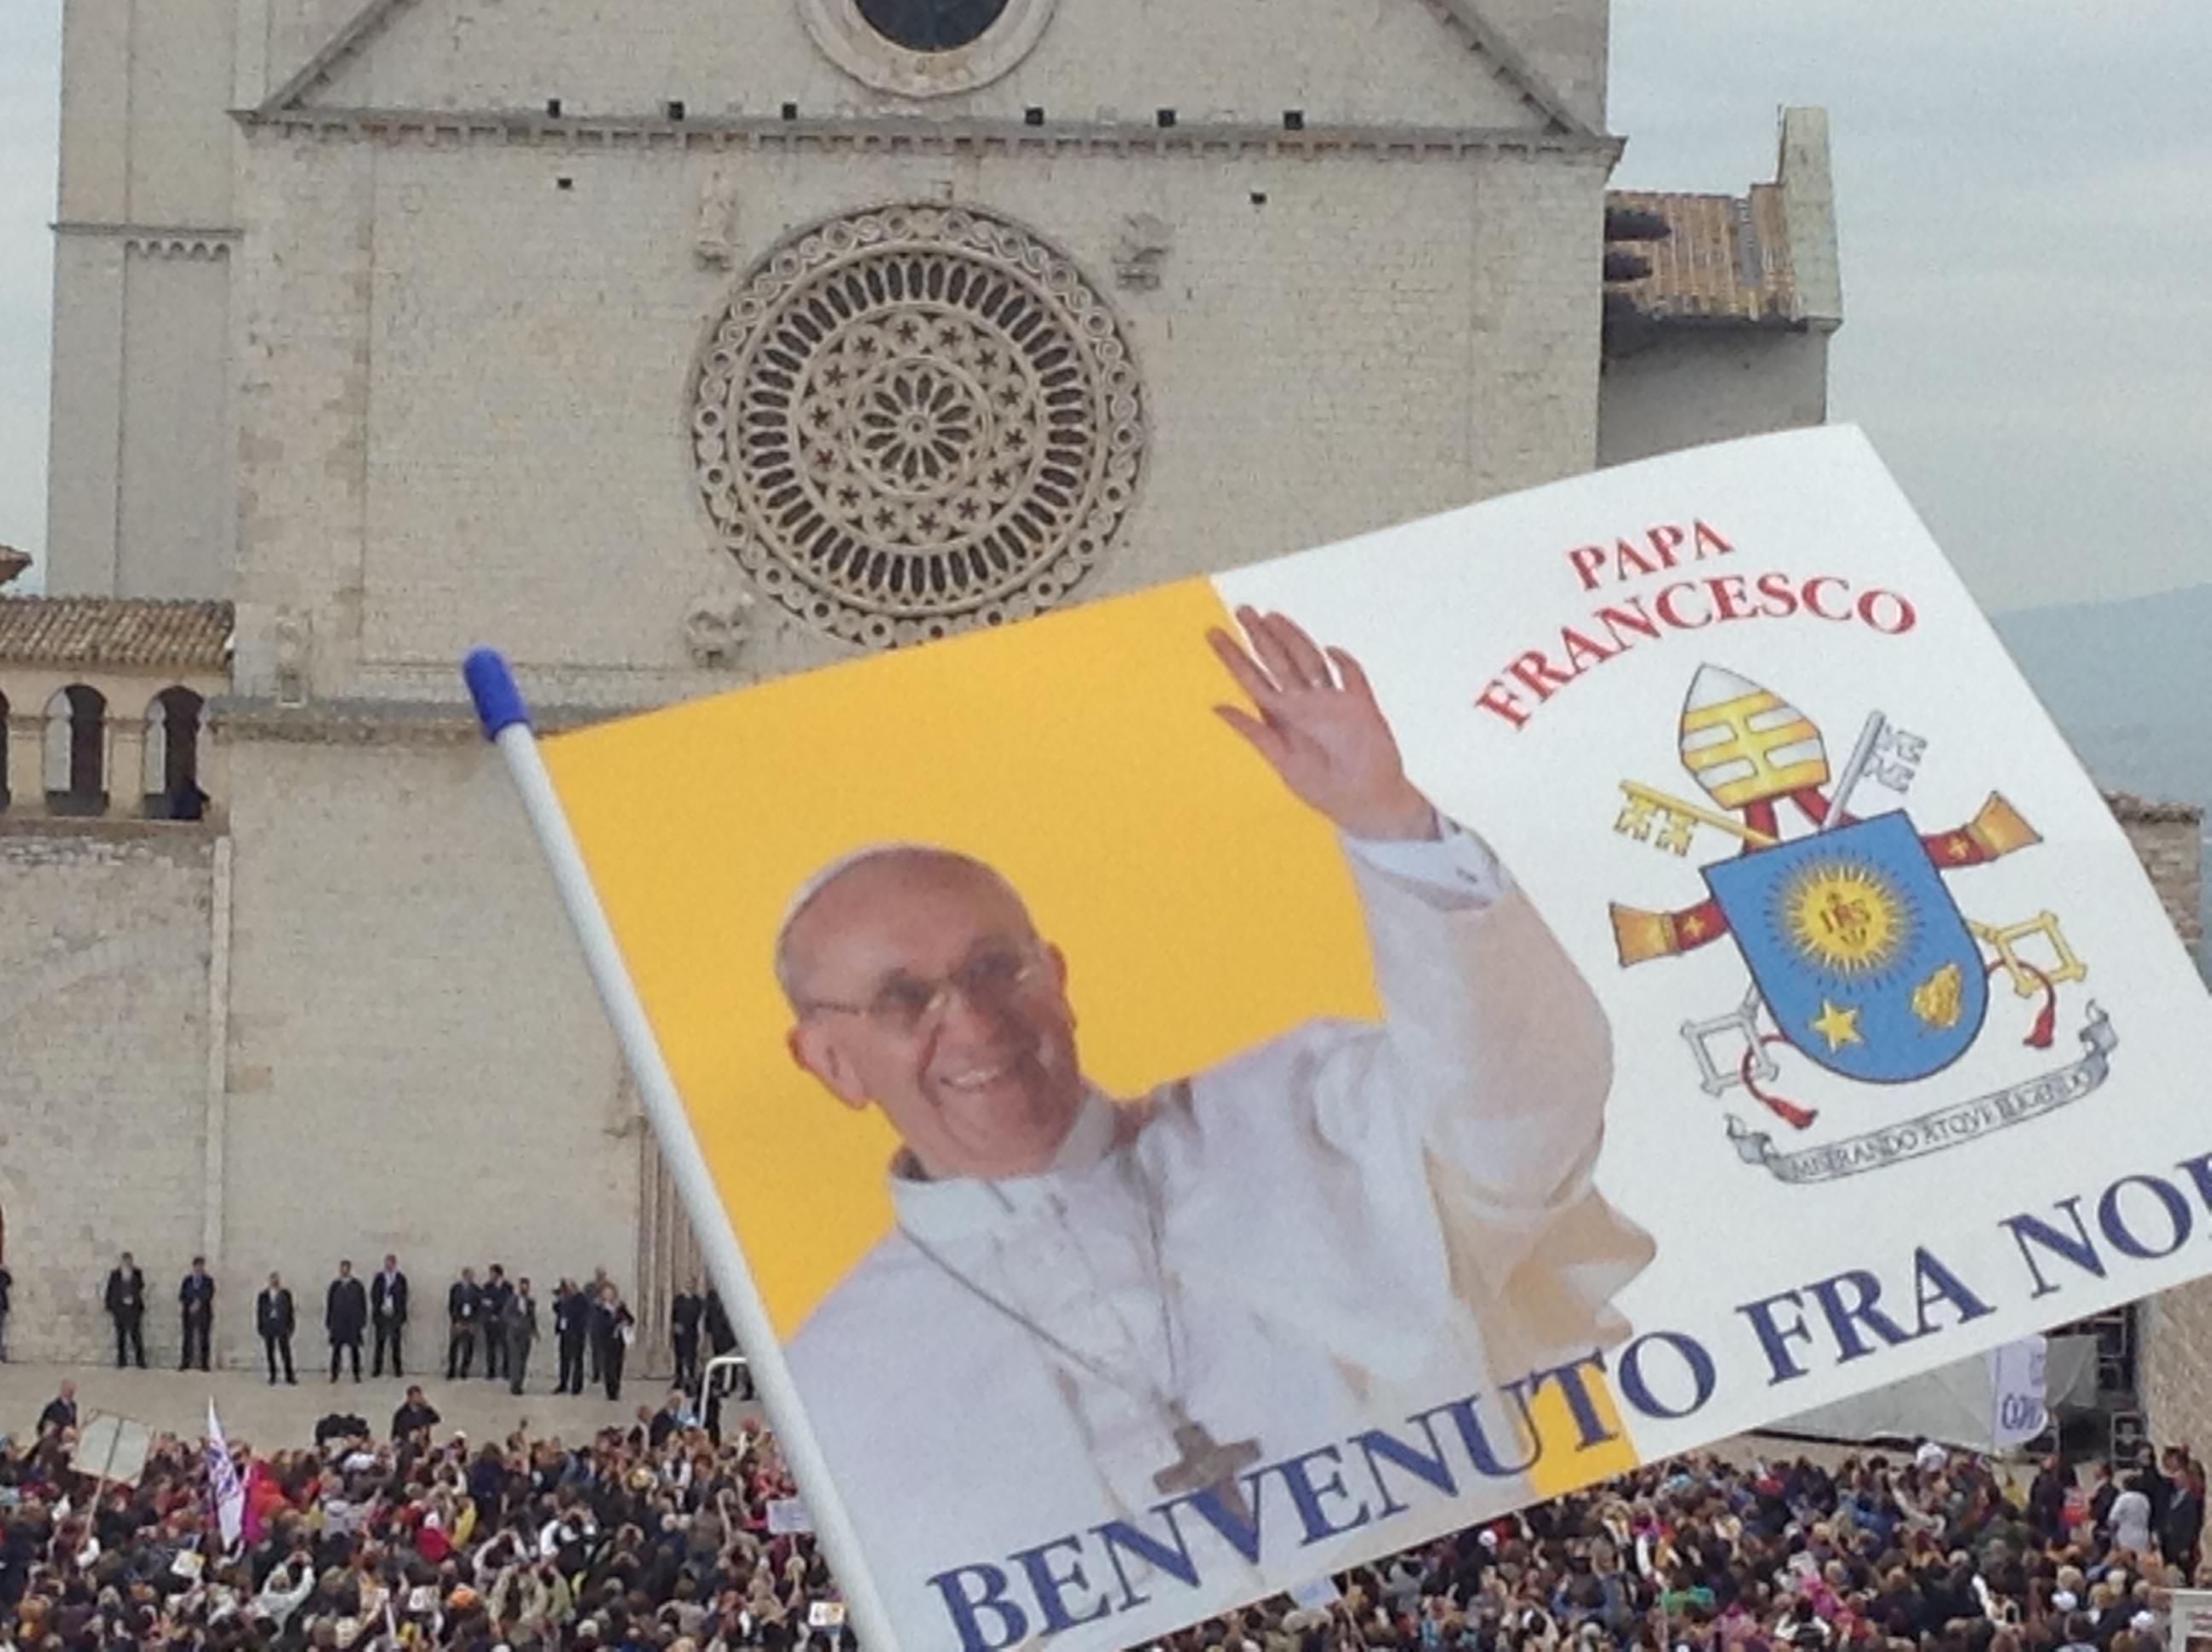 4 ottobre 2013. Papa Francesco ad Assisi